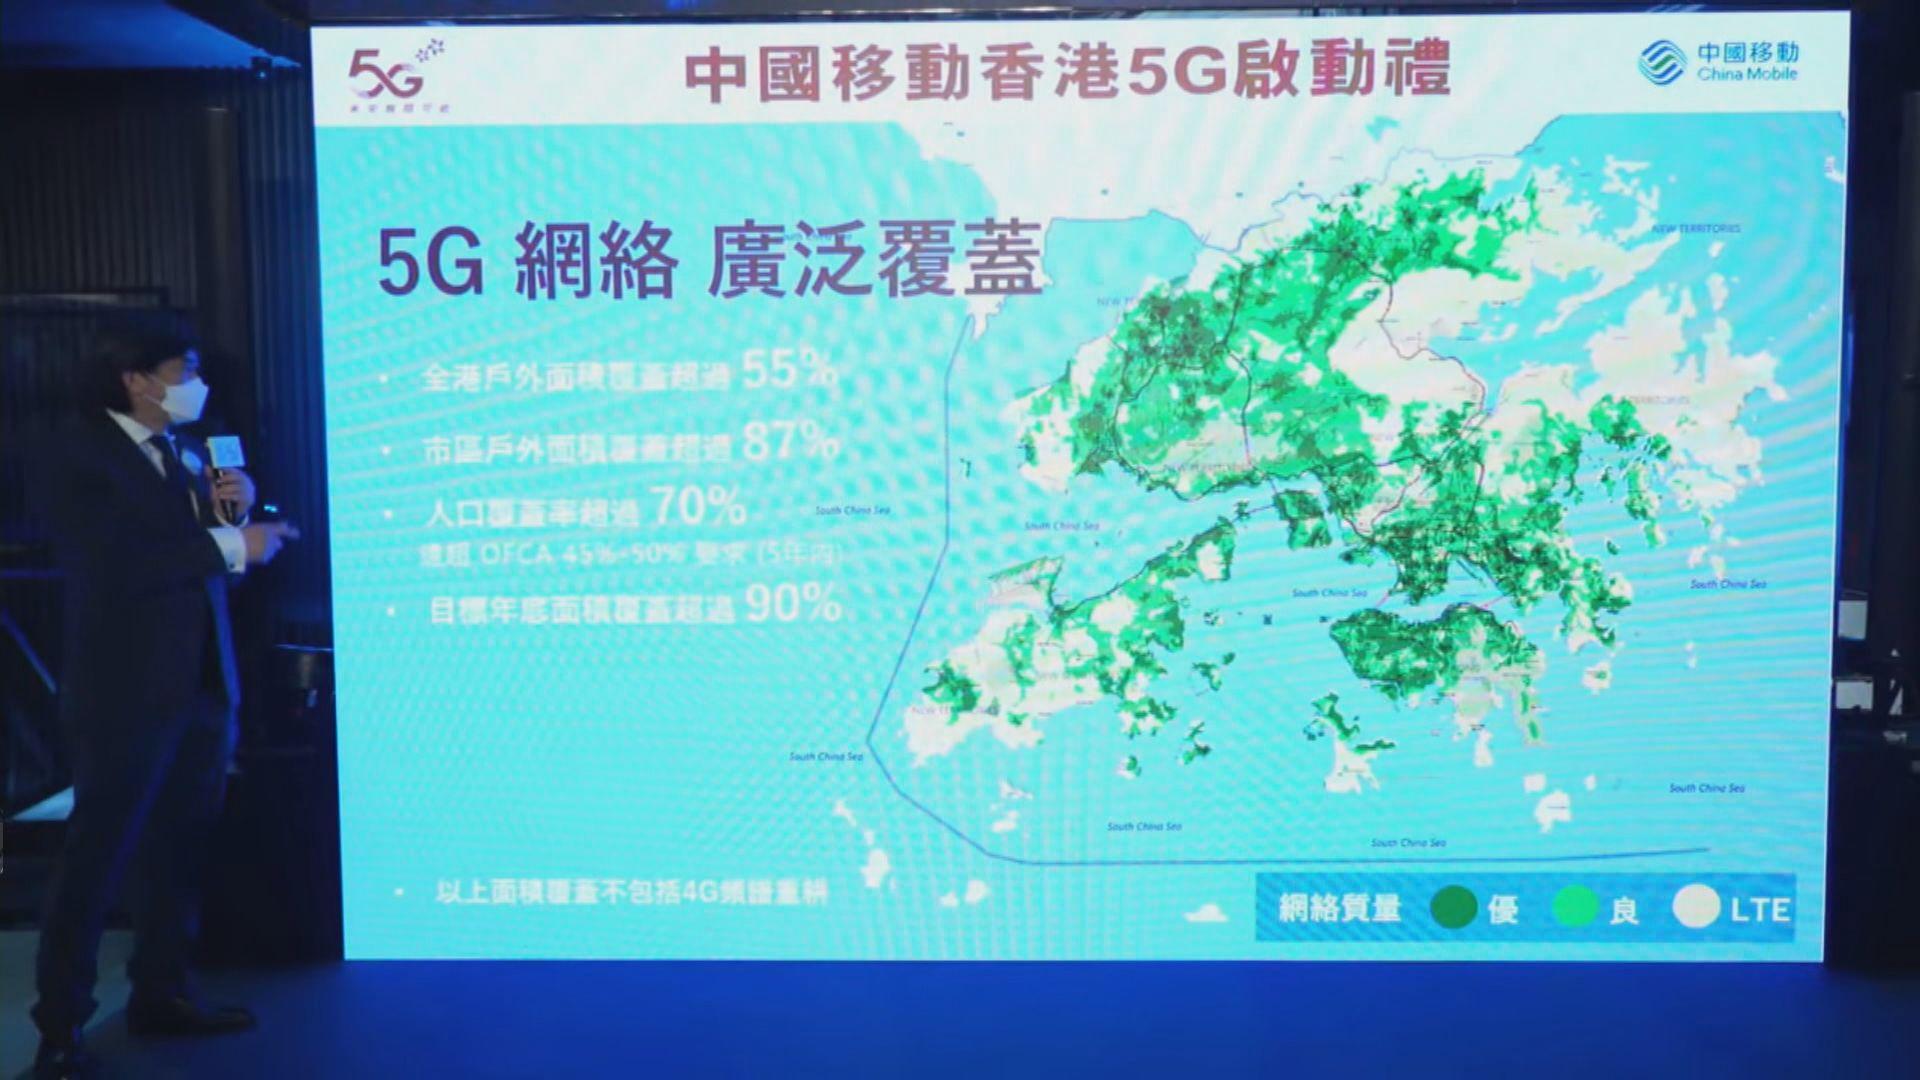 【5G紀元】中移動香港:5G月費未來會隨需求調整